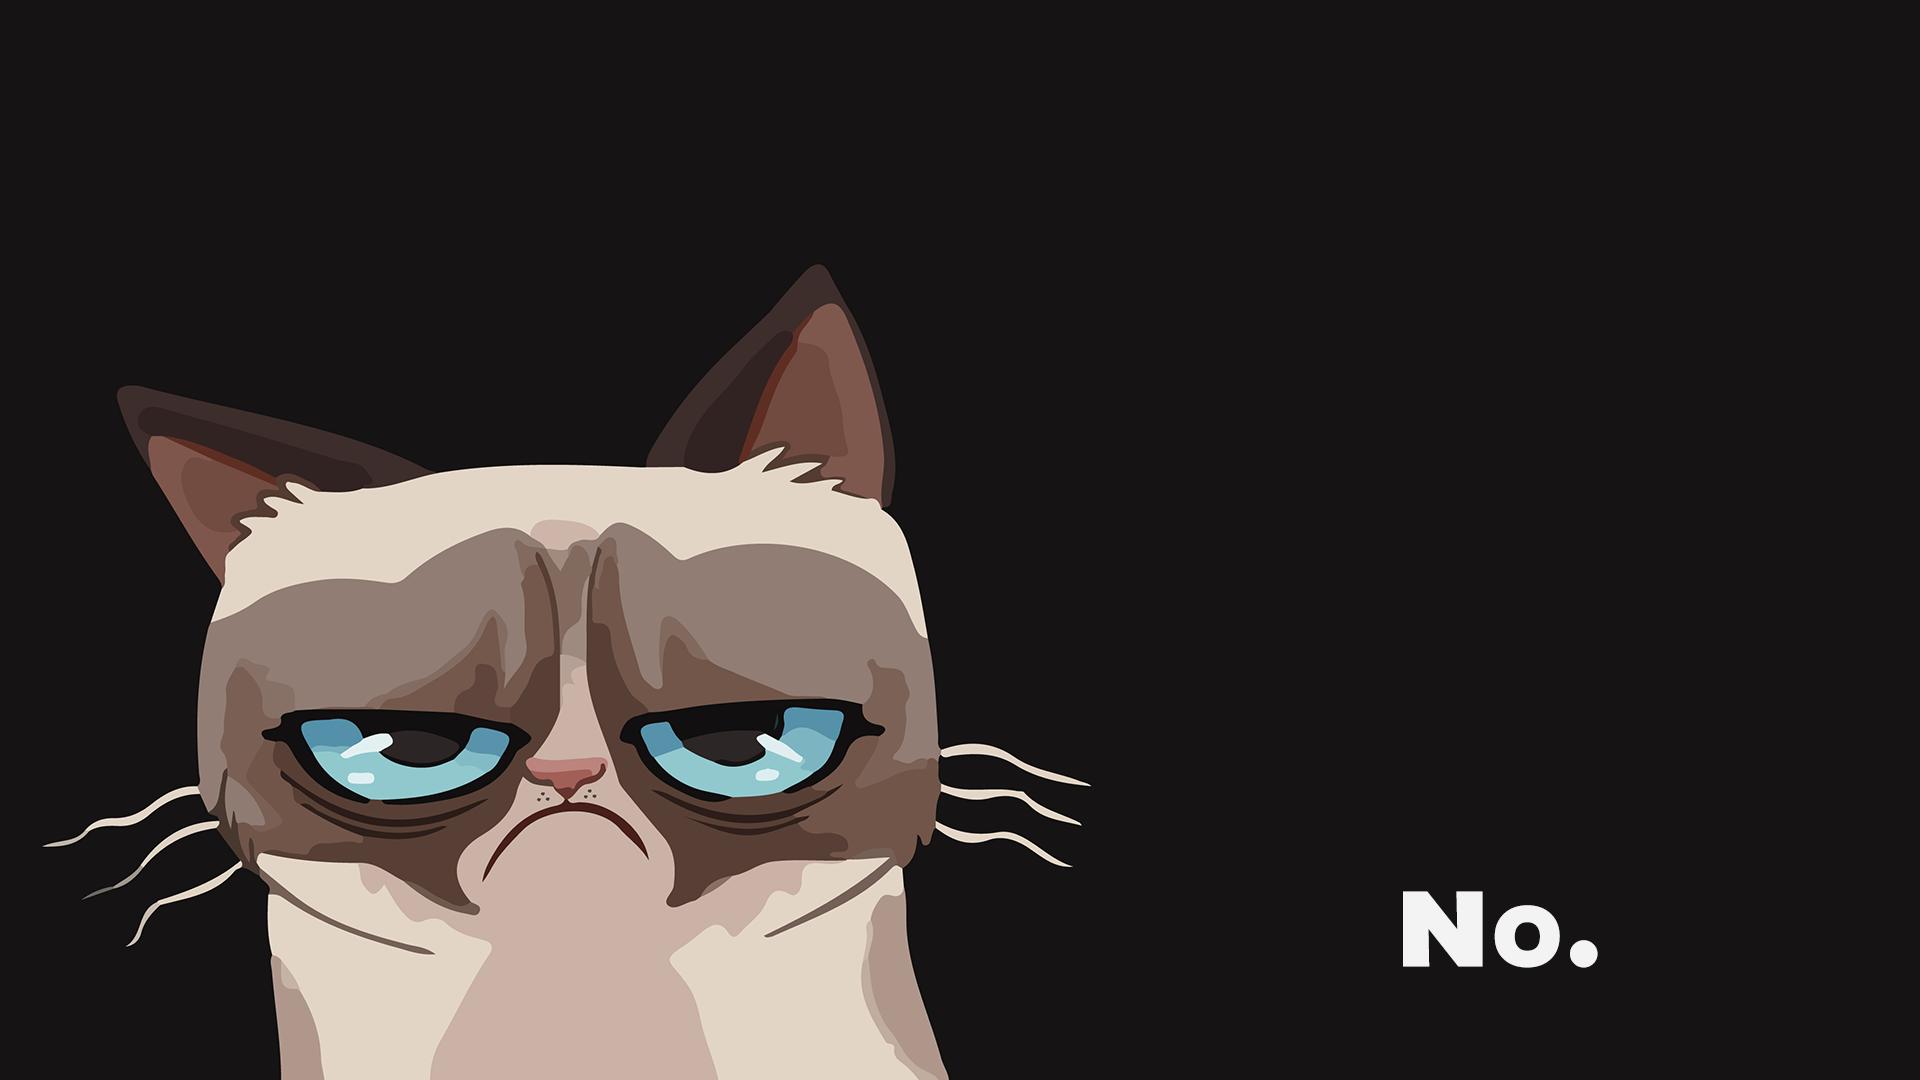 Illustration Cat Glasses Cartoon Grumpy Head Screenshot 1920x1080 Px Vision Care